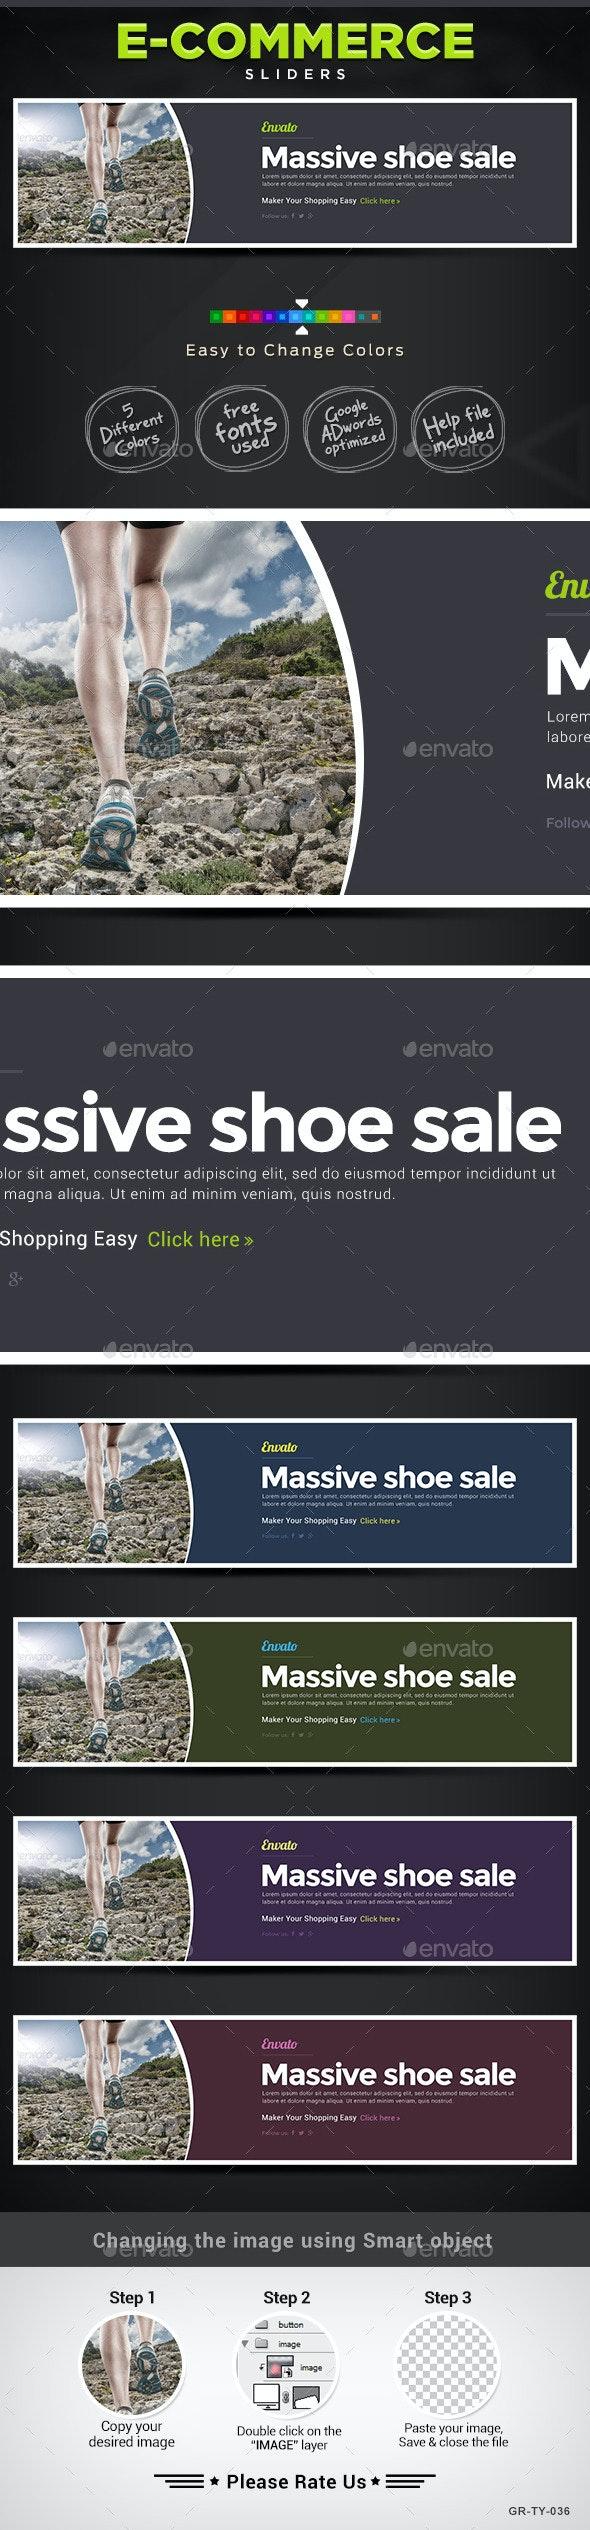 E-Commerce Sliders - Sliders & Features Web Elements